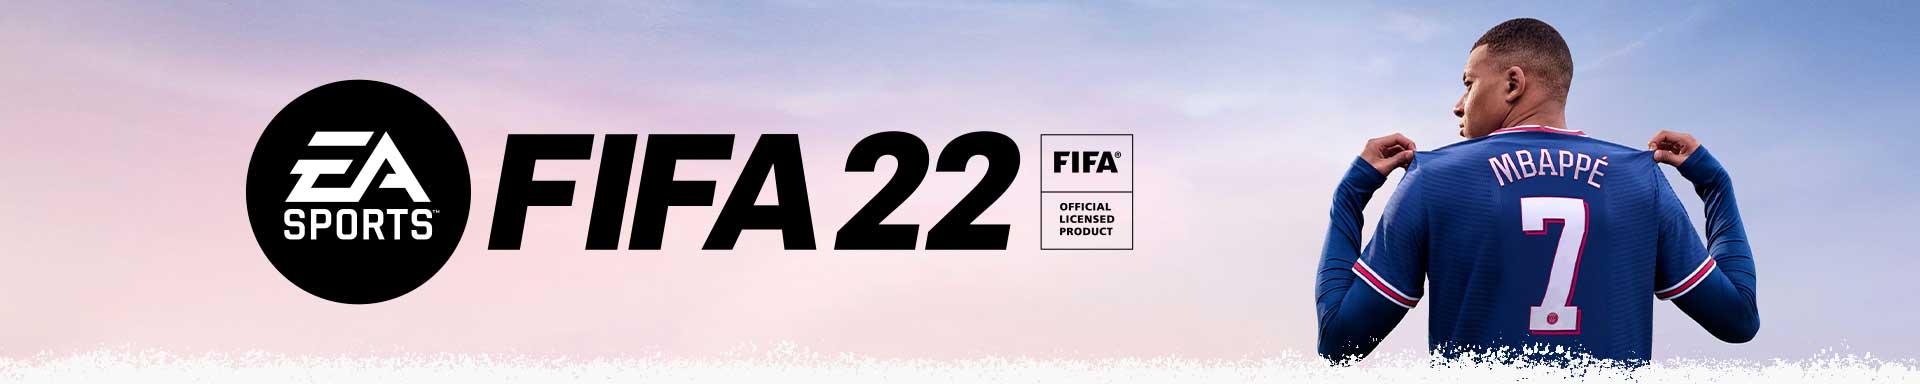 fifa 22 background kat